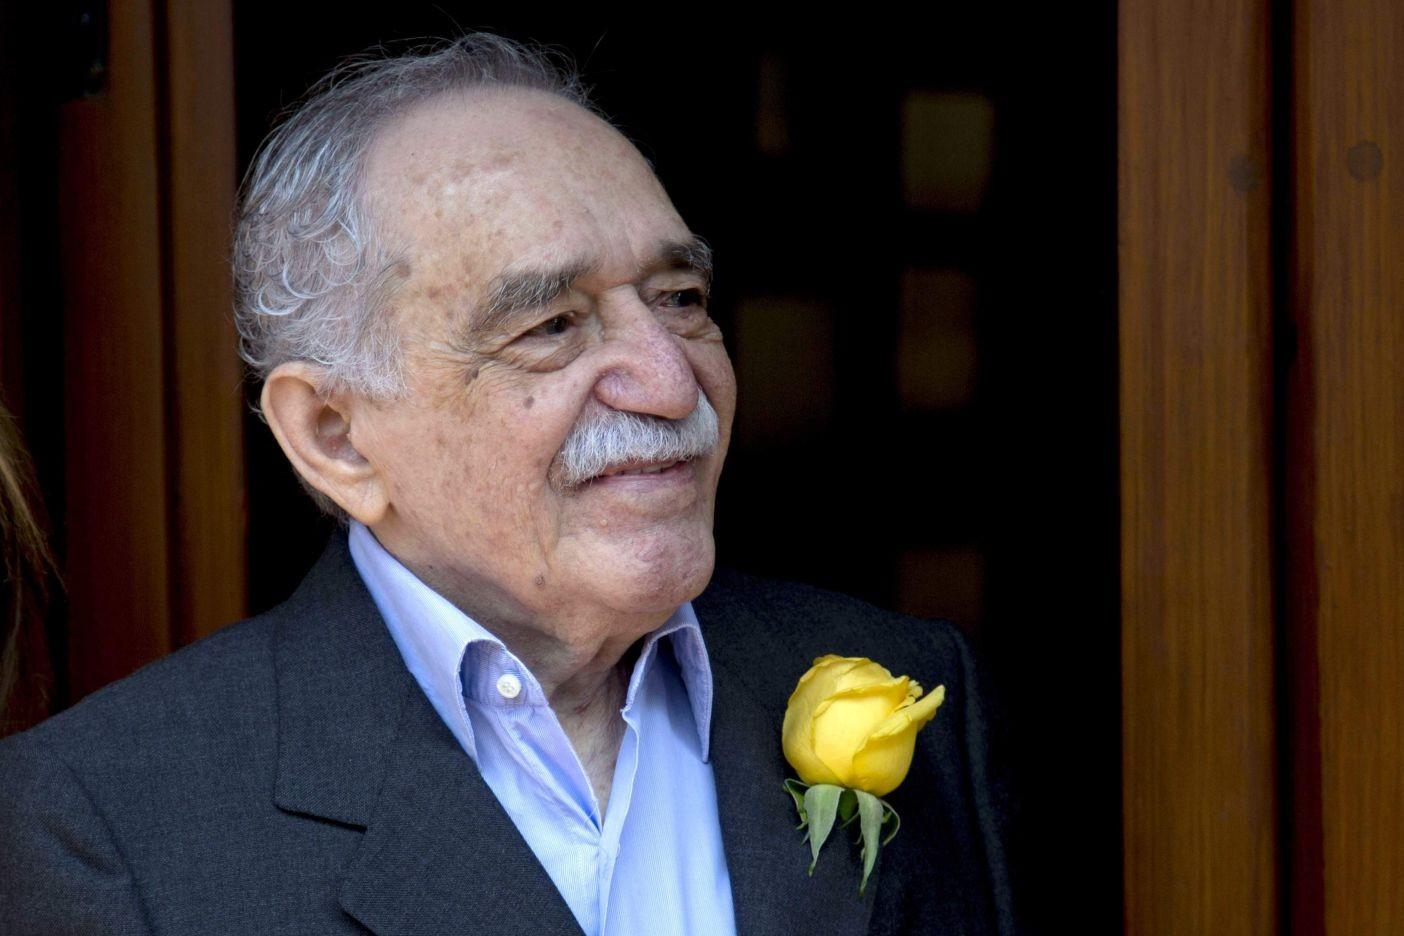 Архив Габриэля Гарсиа Маркеса продали за $2,2 млн